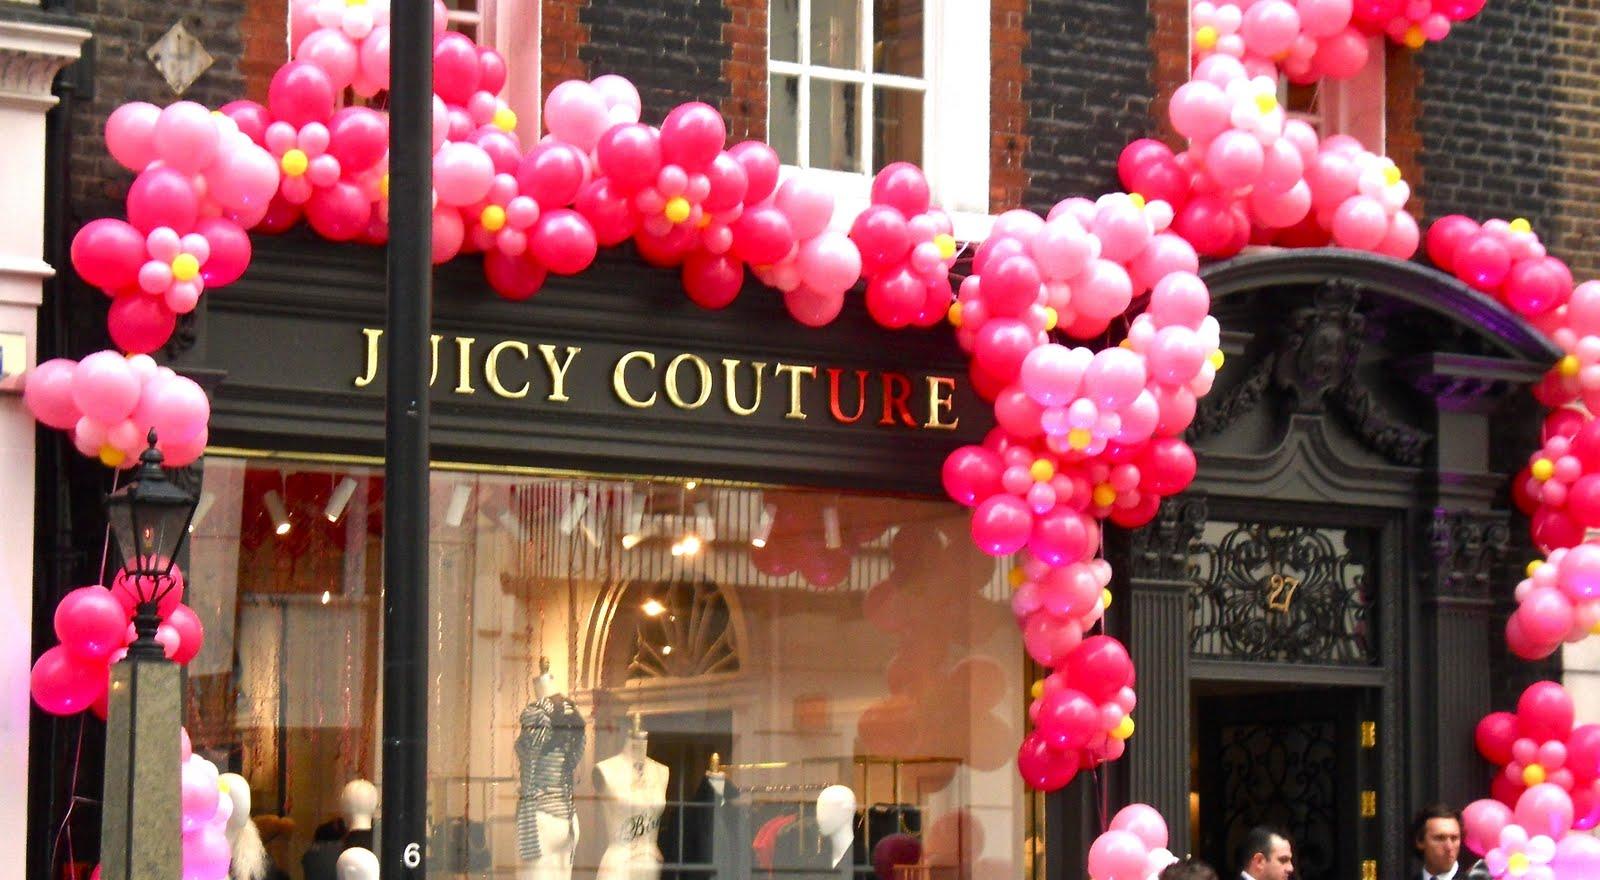 Www Cuisinella Satisfaction Com licence de marques | the retail news